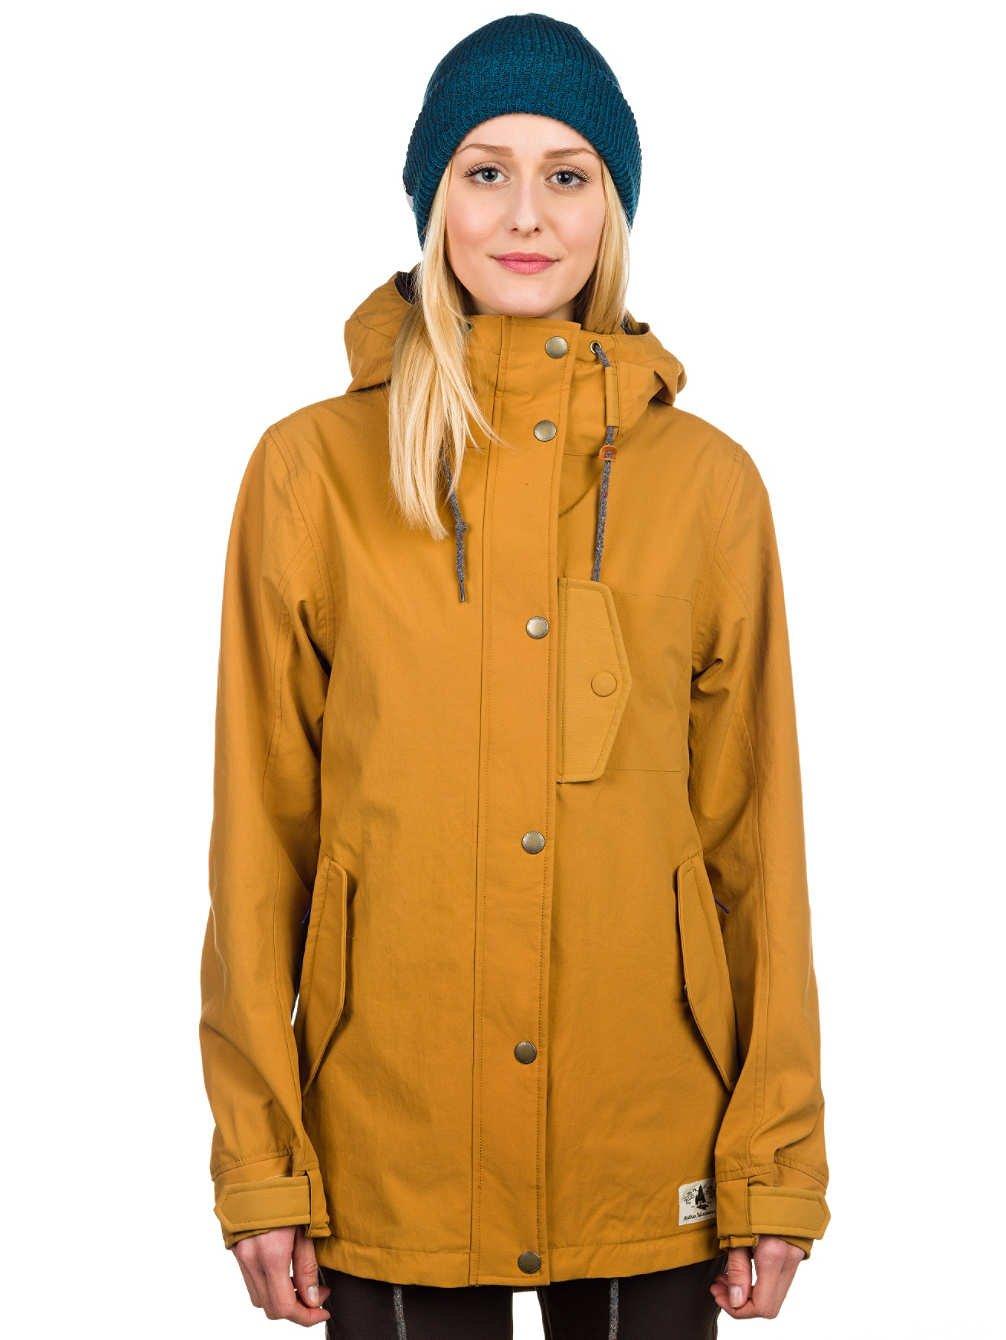 Damen Snowboard Jacke Holden Hana Jacket jetzt kaufen